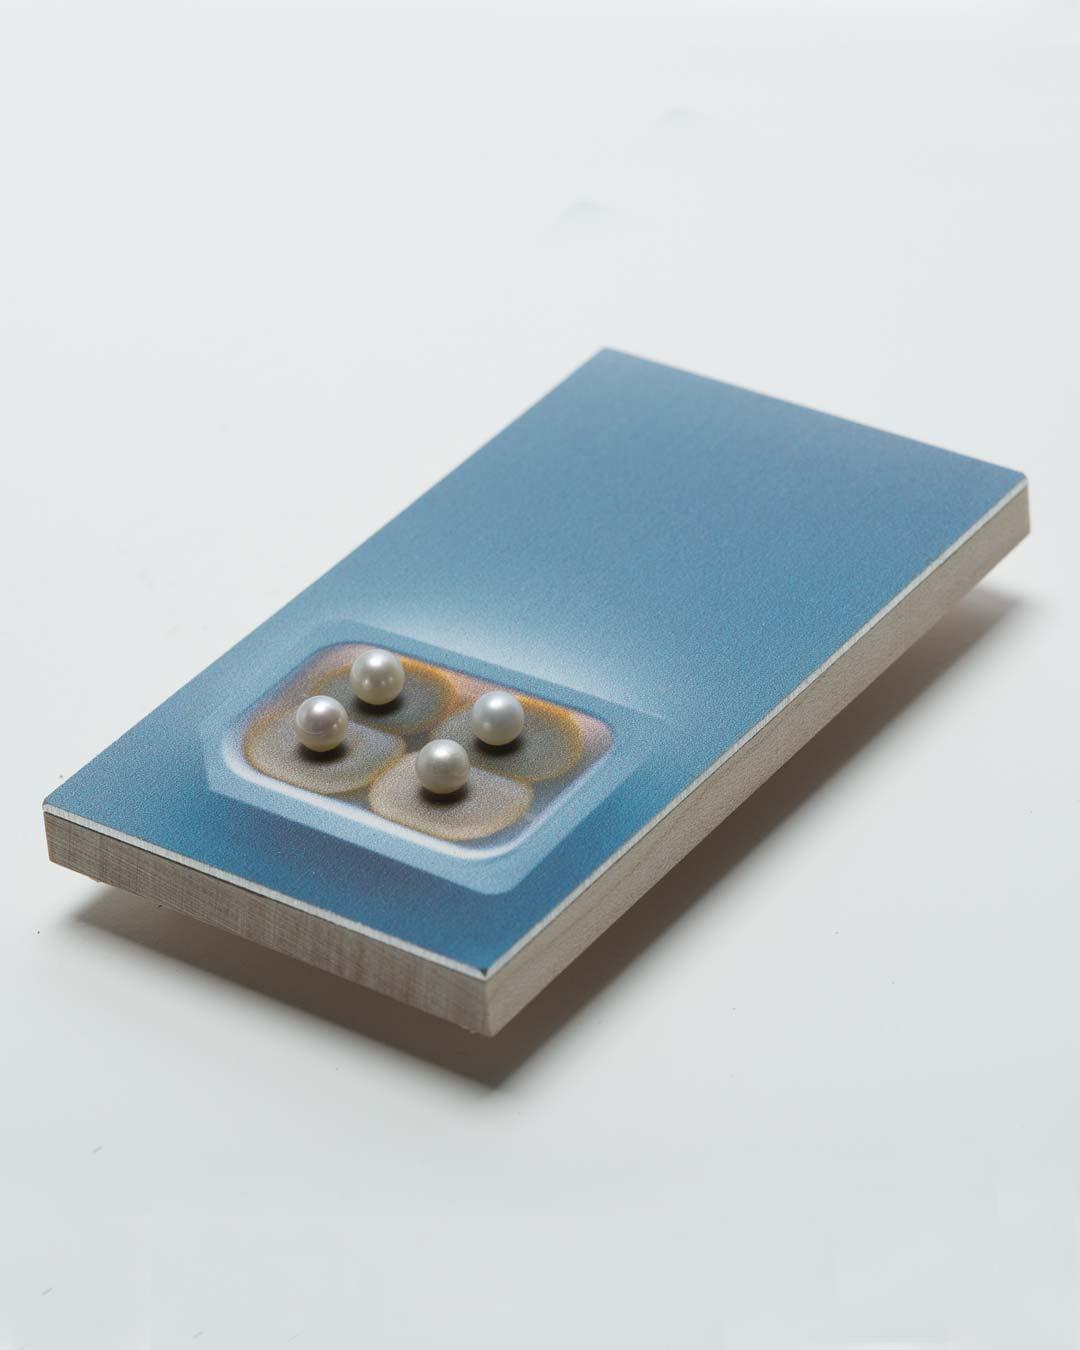 Herman Hermsen, Butternuts, 2017, brooch; print on aluminium, wood, freshwater pearls, 79 x 45 x 17 mm, €230